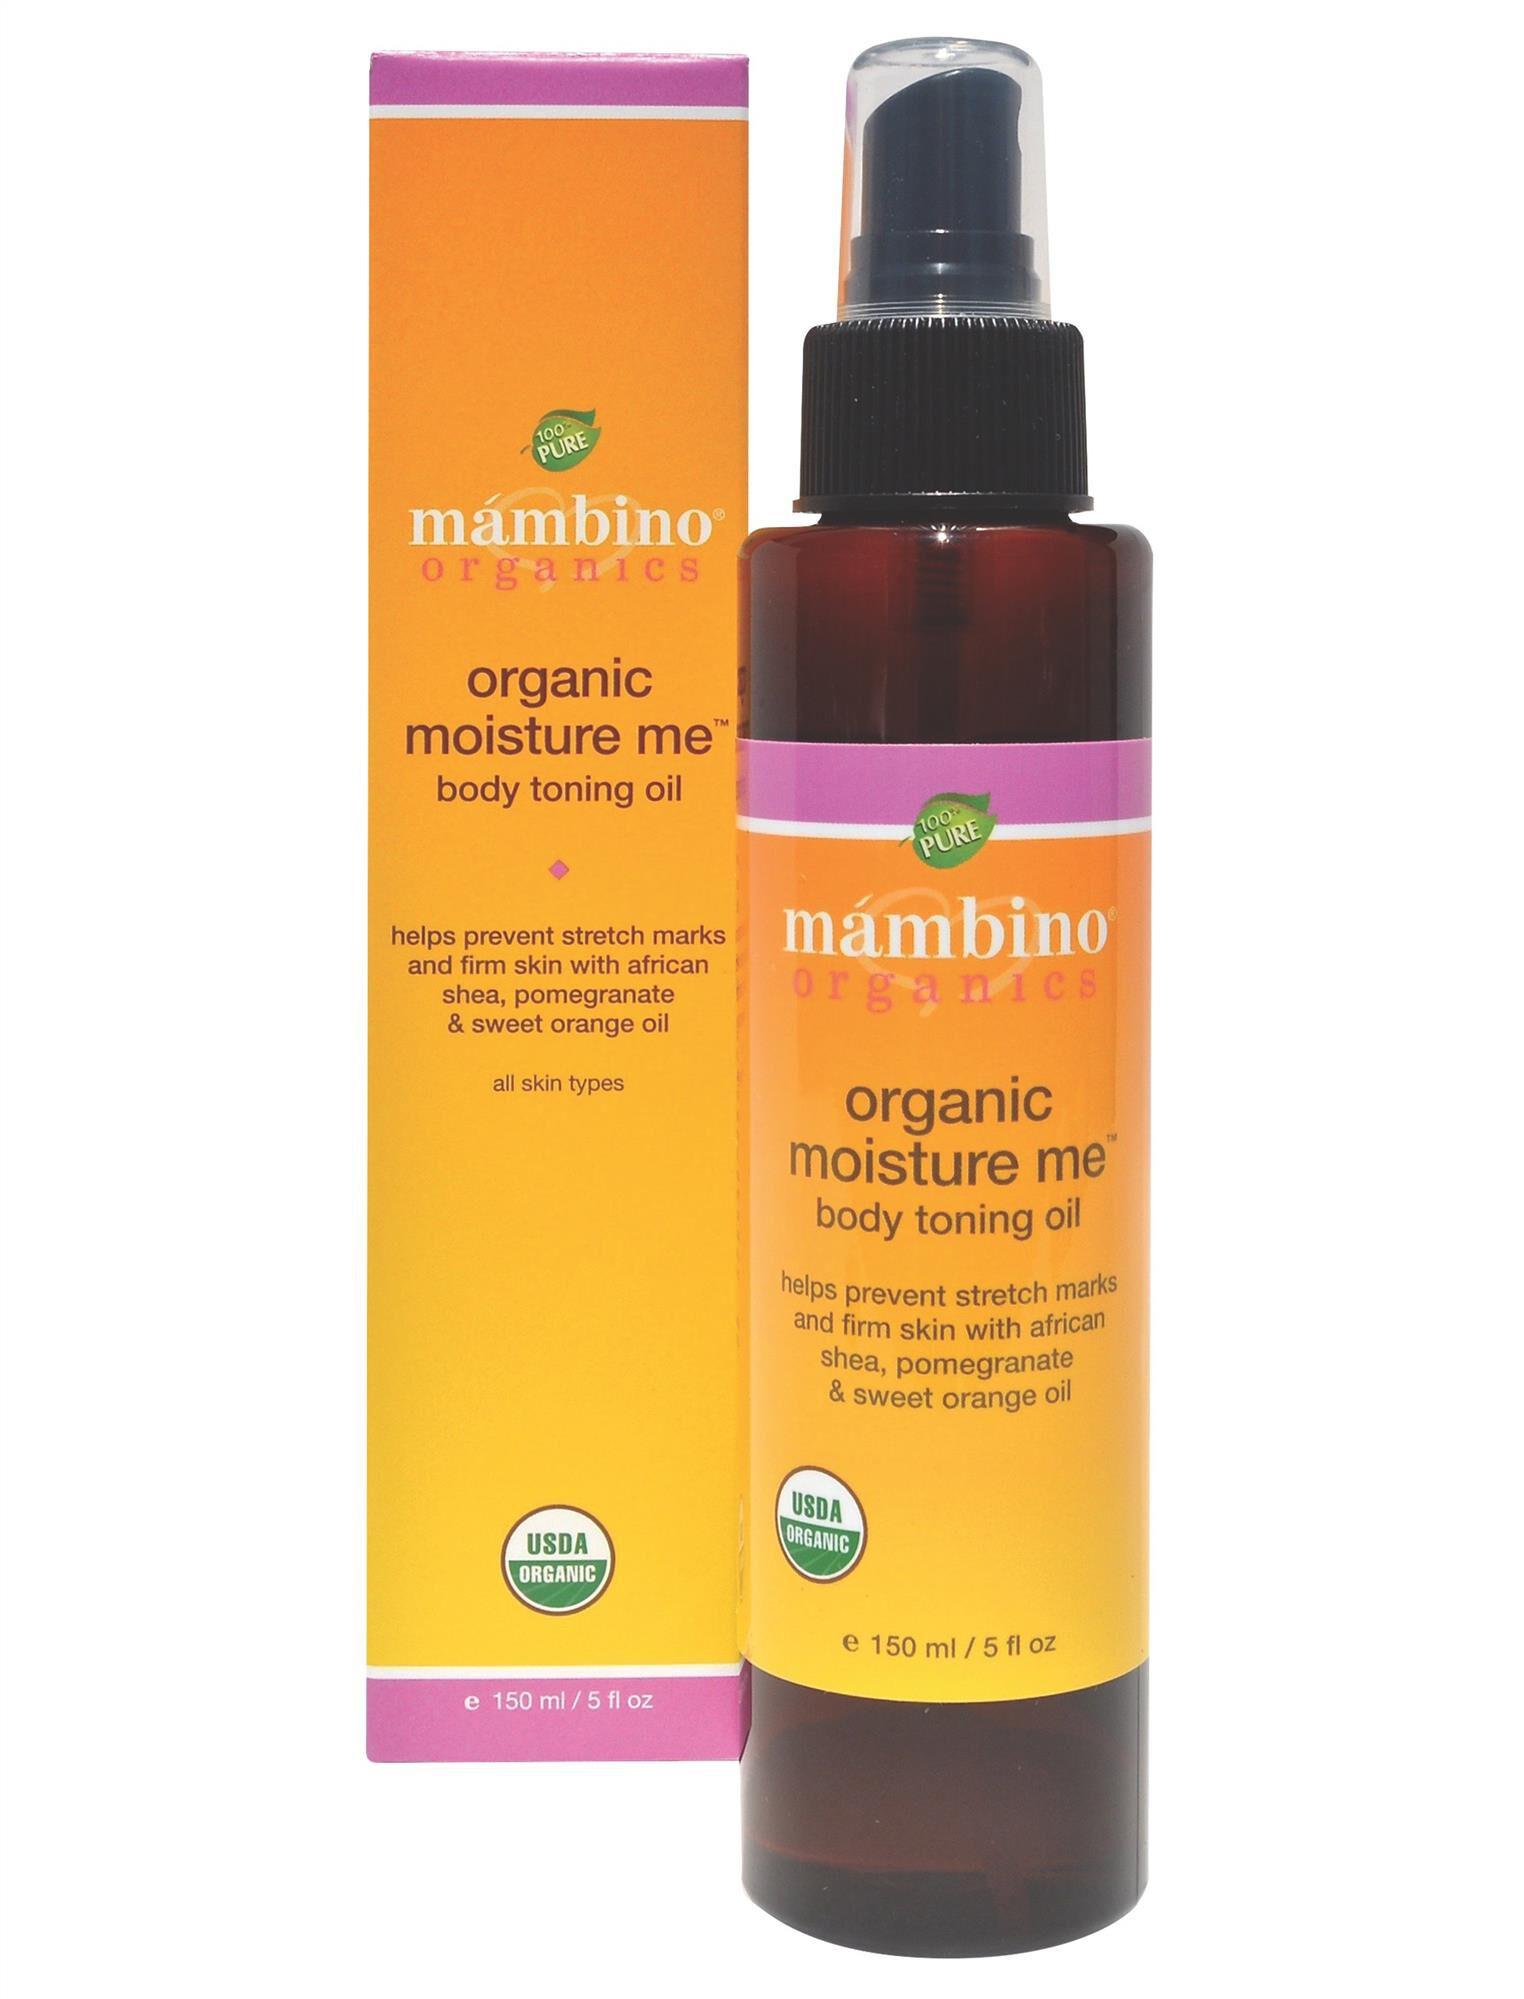 Mambino Organic Moisture Me Body Toning Oil